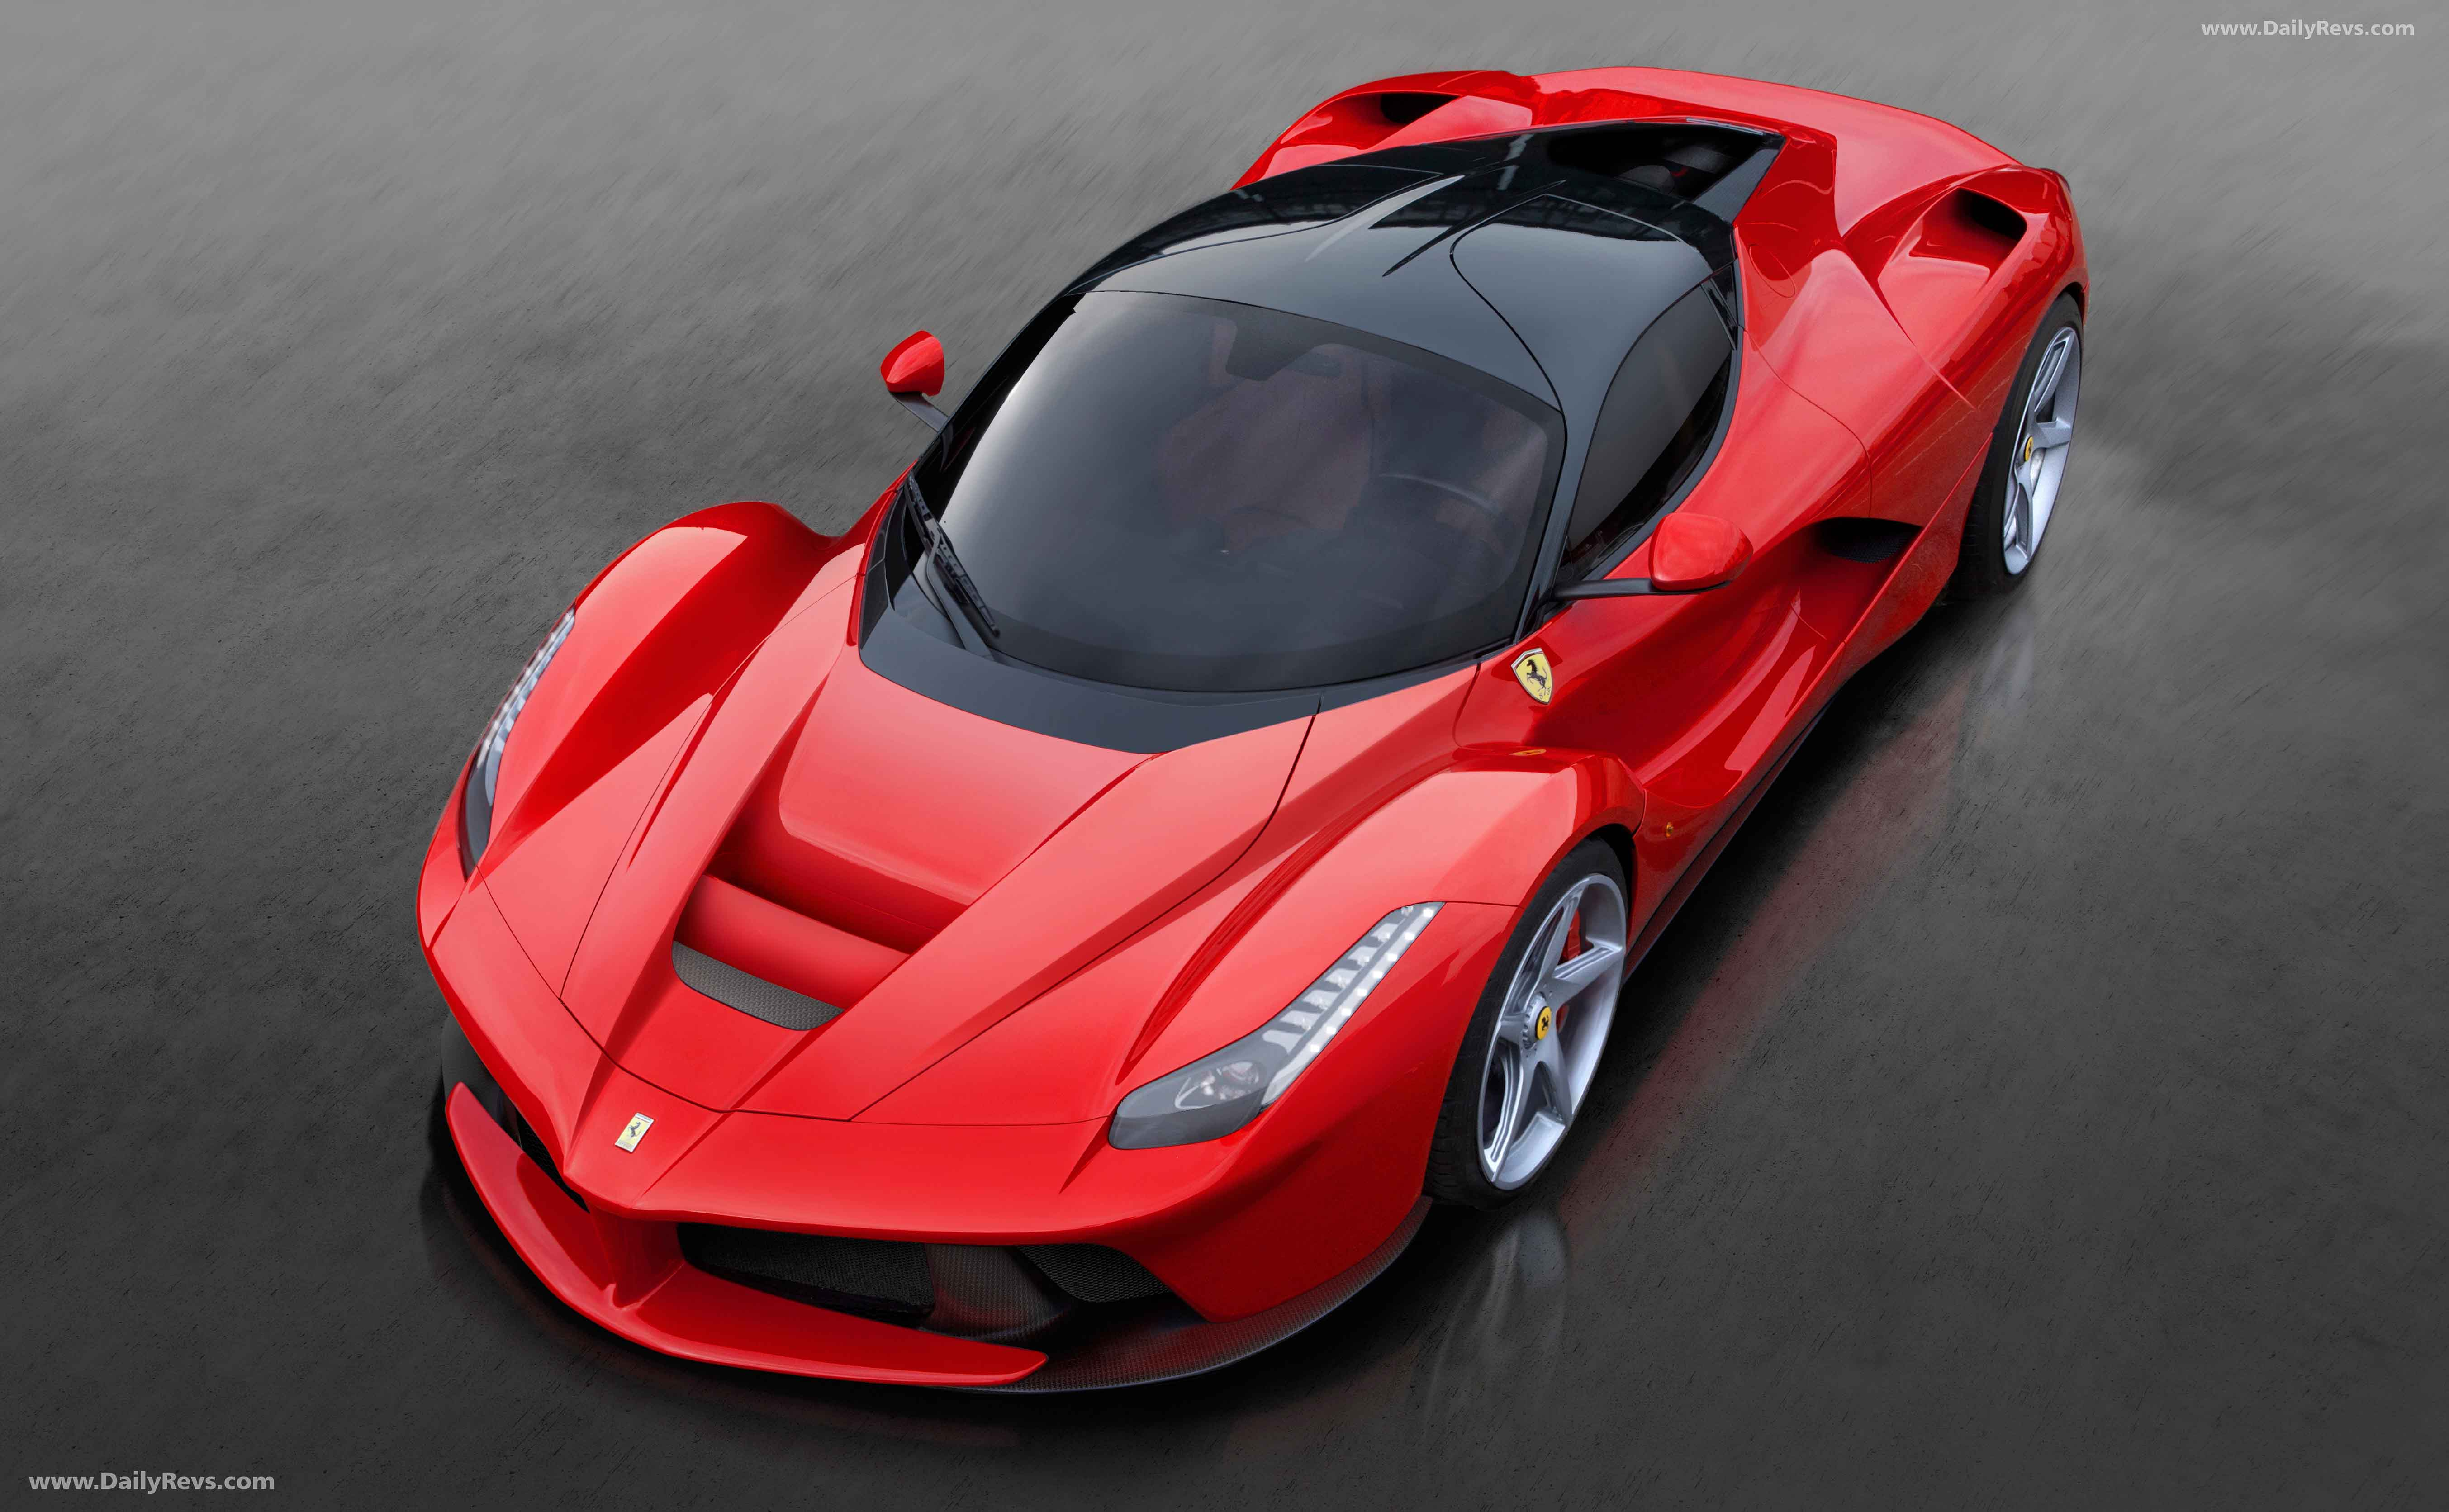 2014 Ferrari LaFerrari full